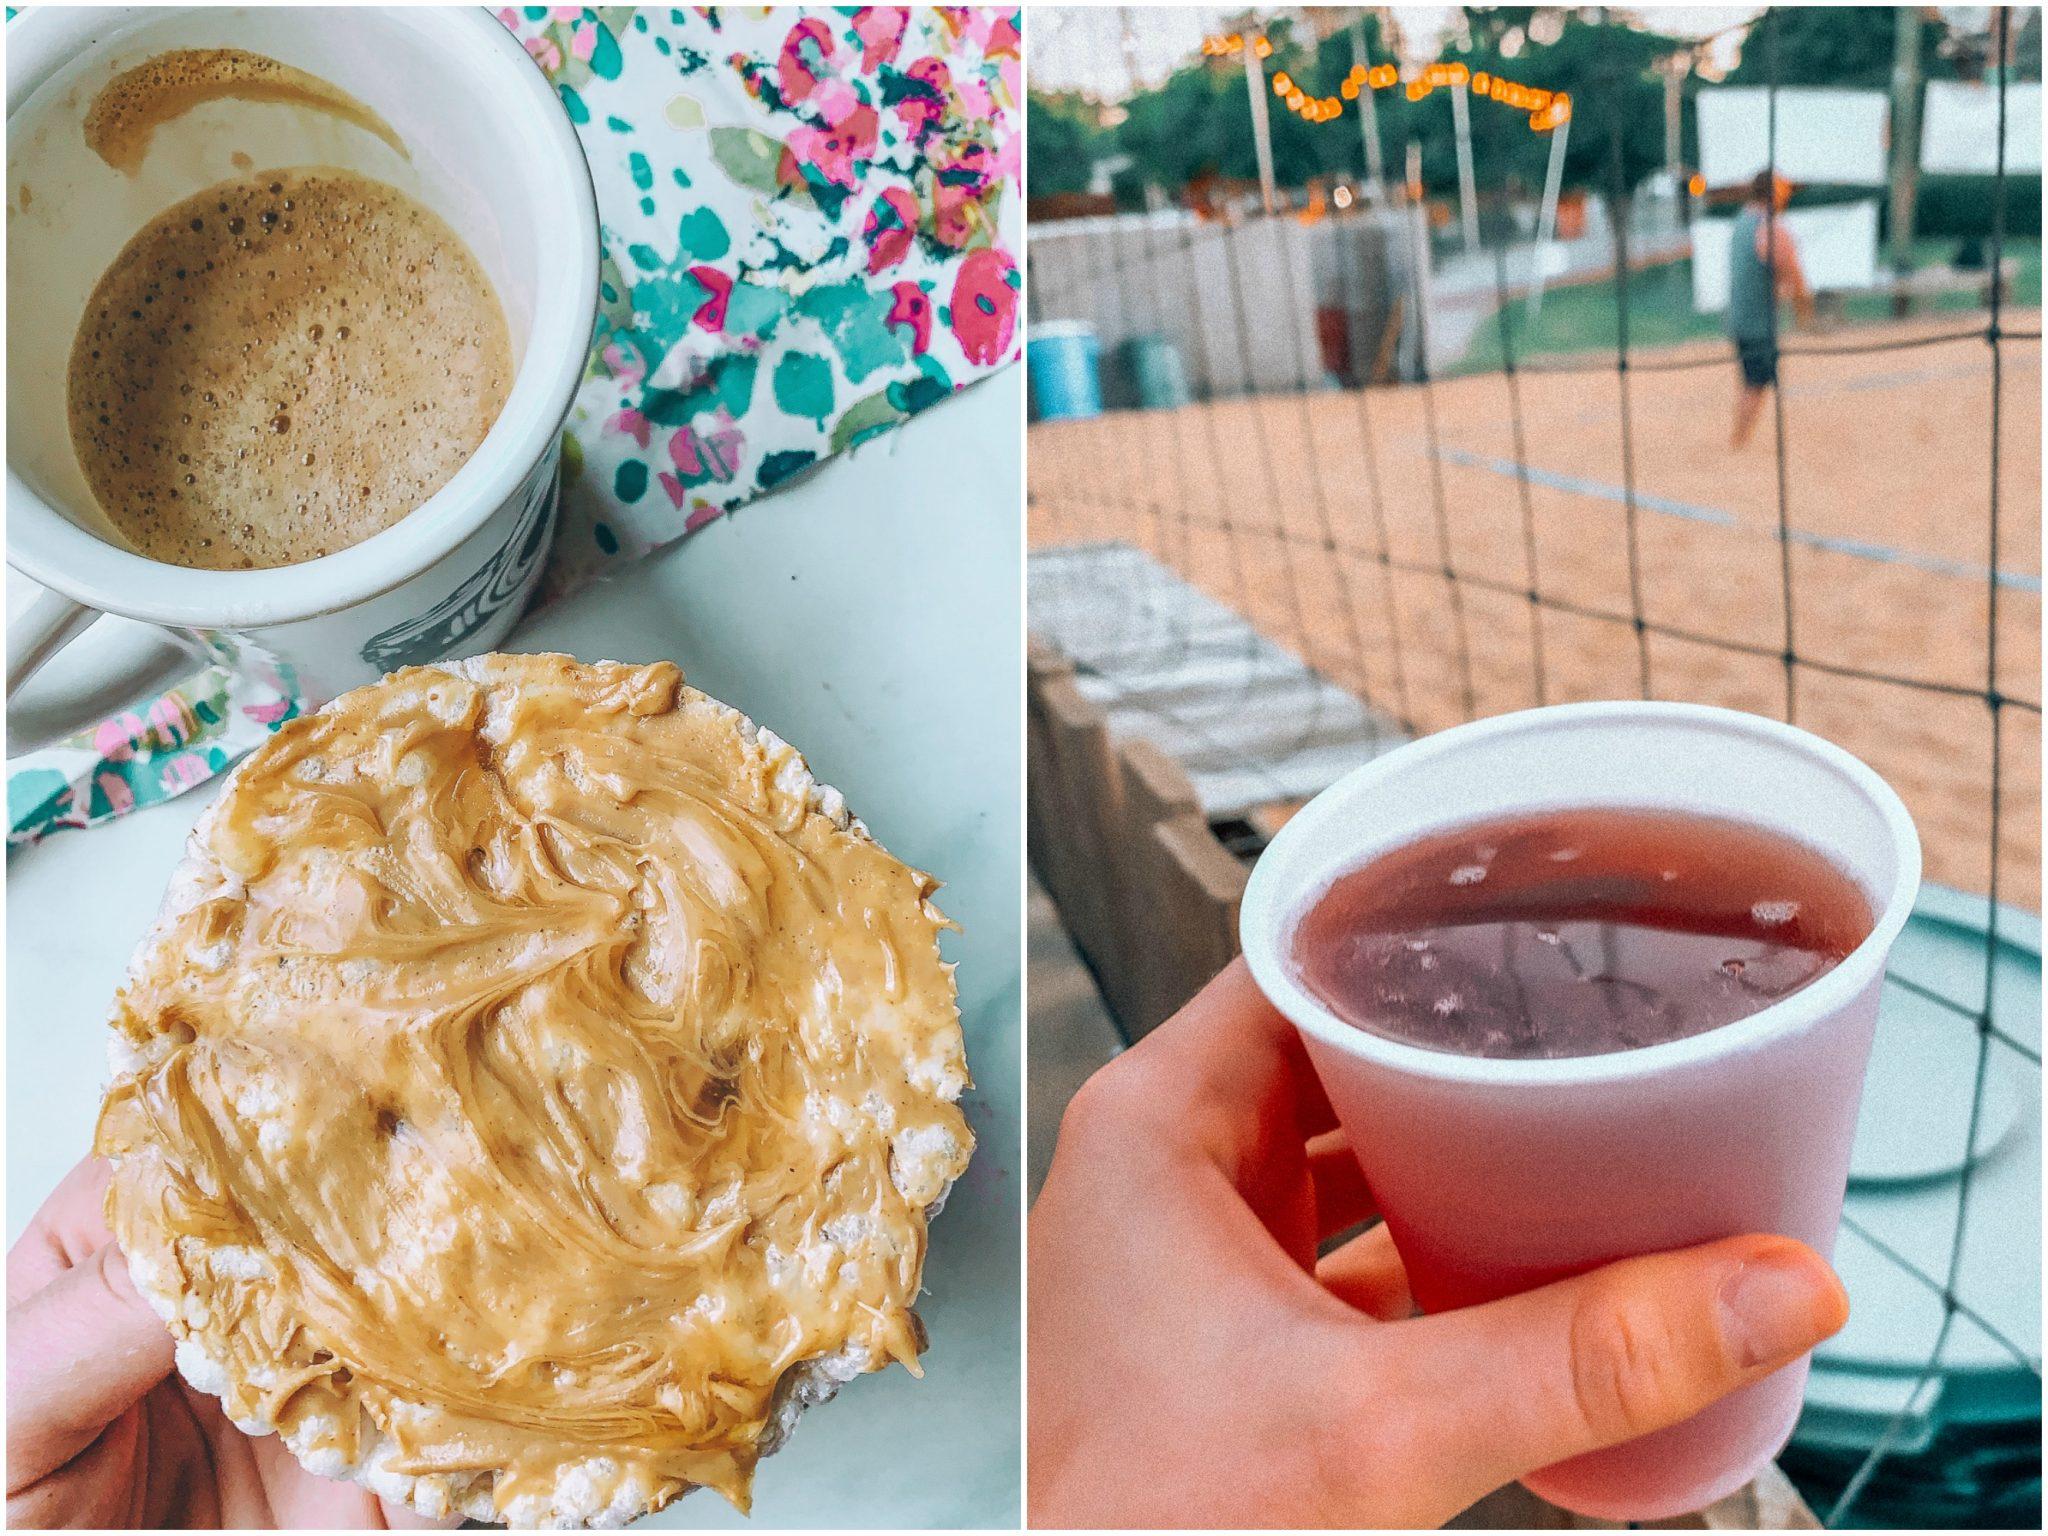 beer garden cider volleyball Charlotte North Carolina peanut butter gluten free honey snack rice cake coffee